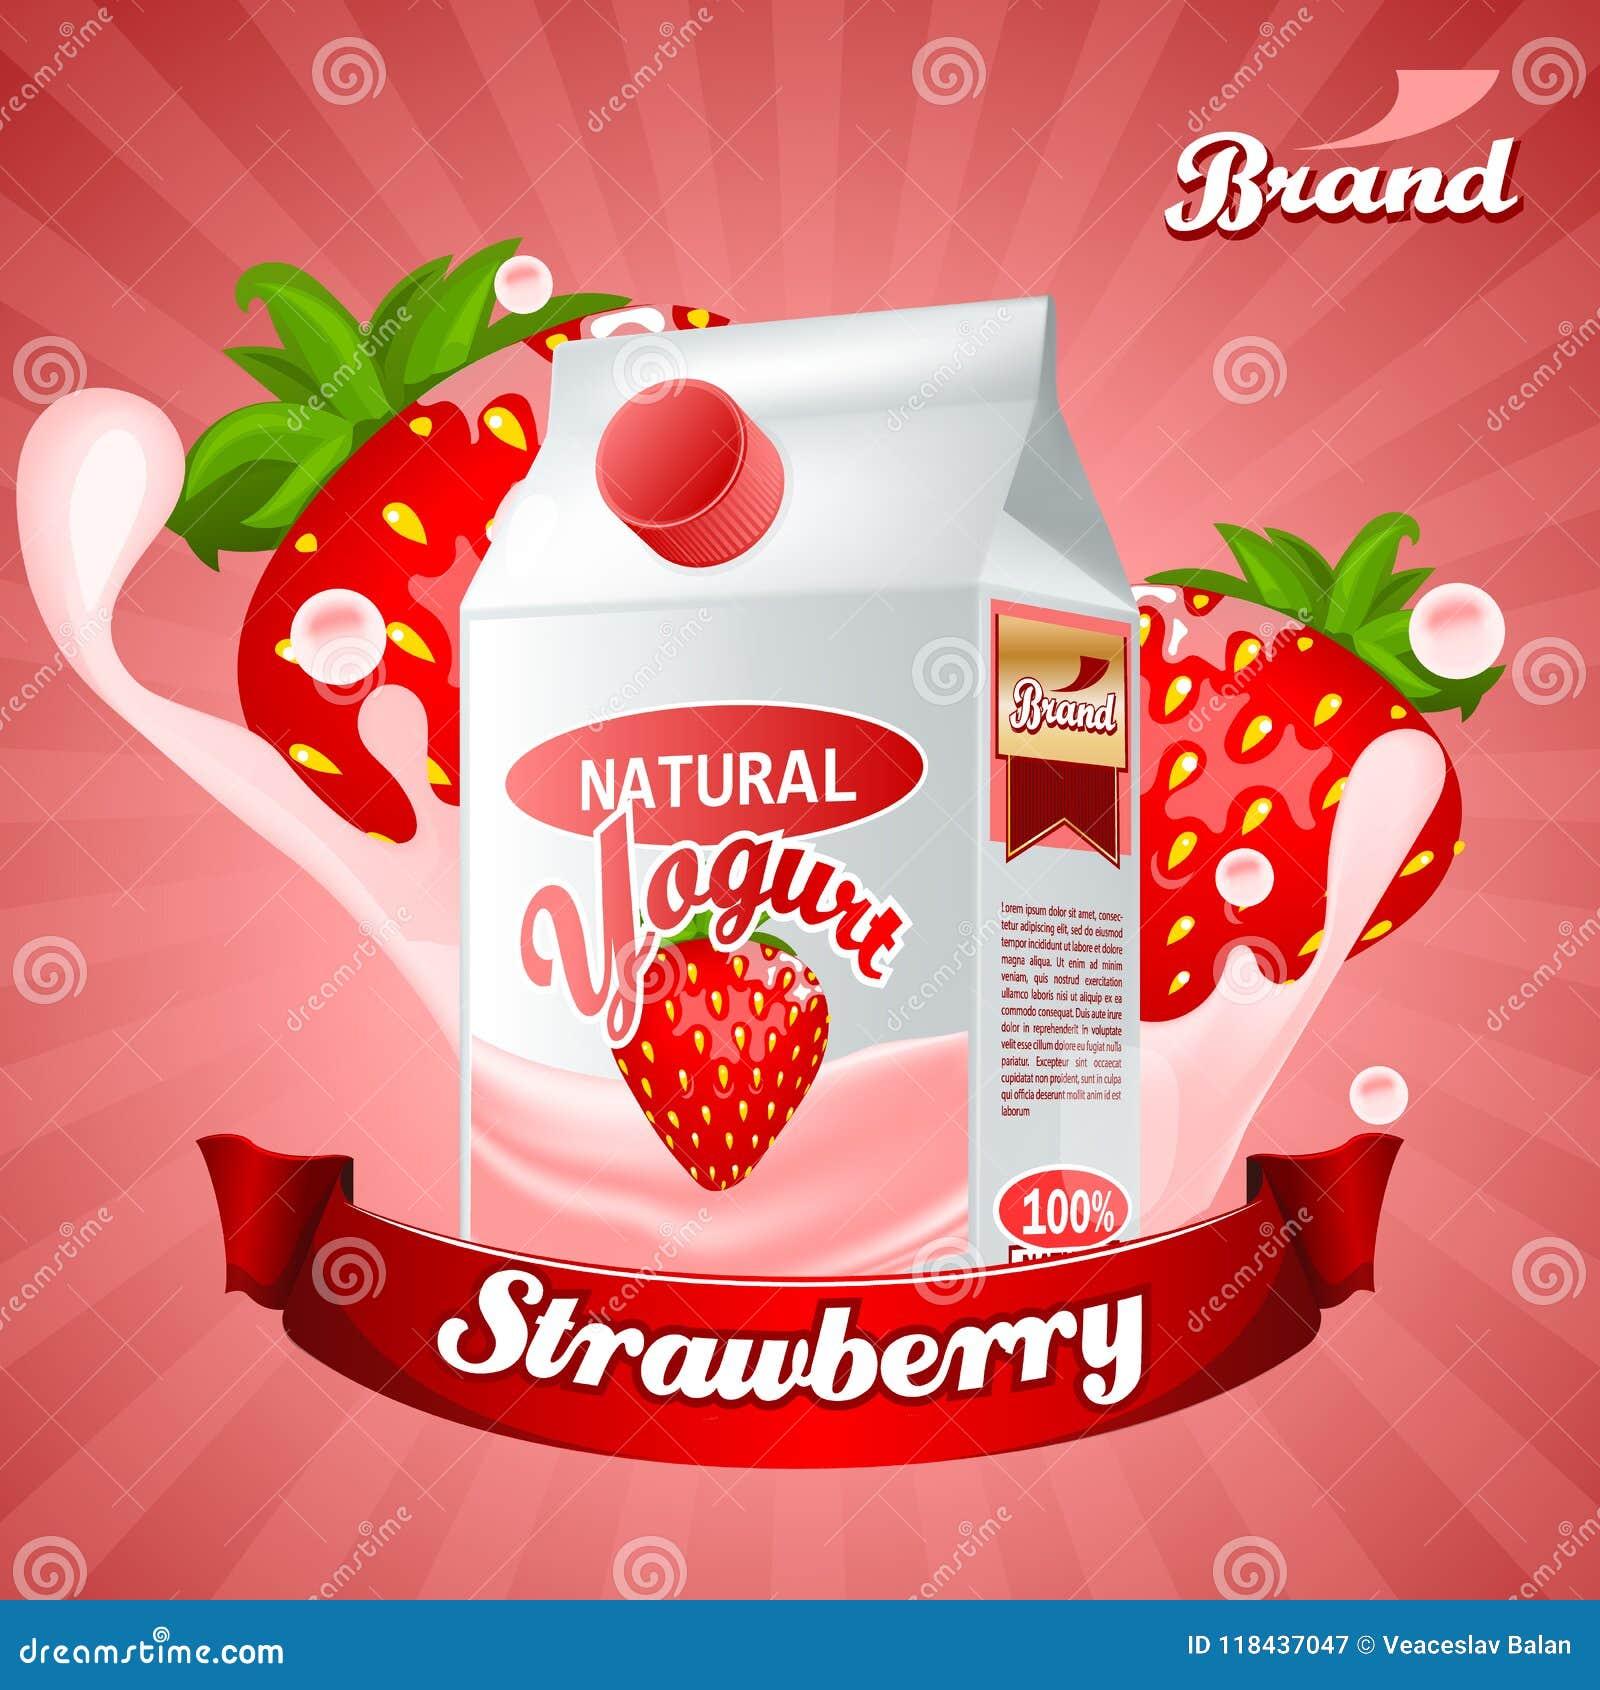 strawberry yogurt ads splashing scene with package and fruits